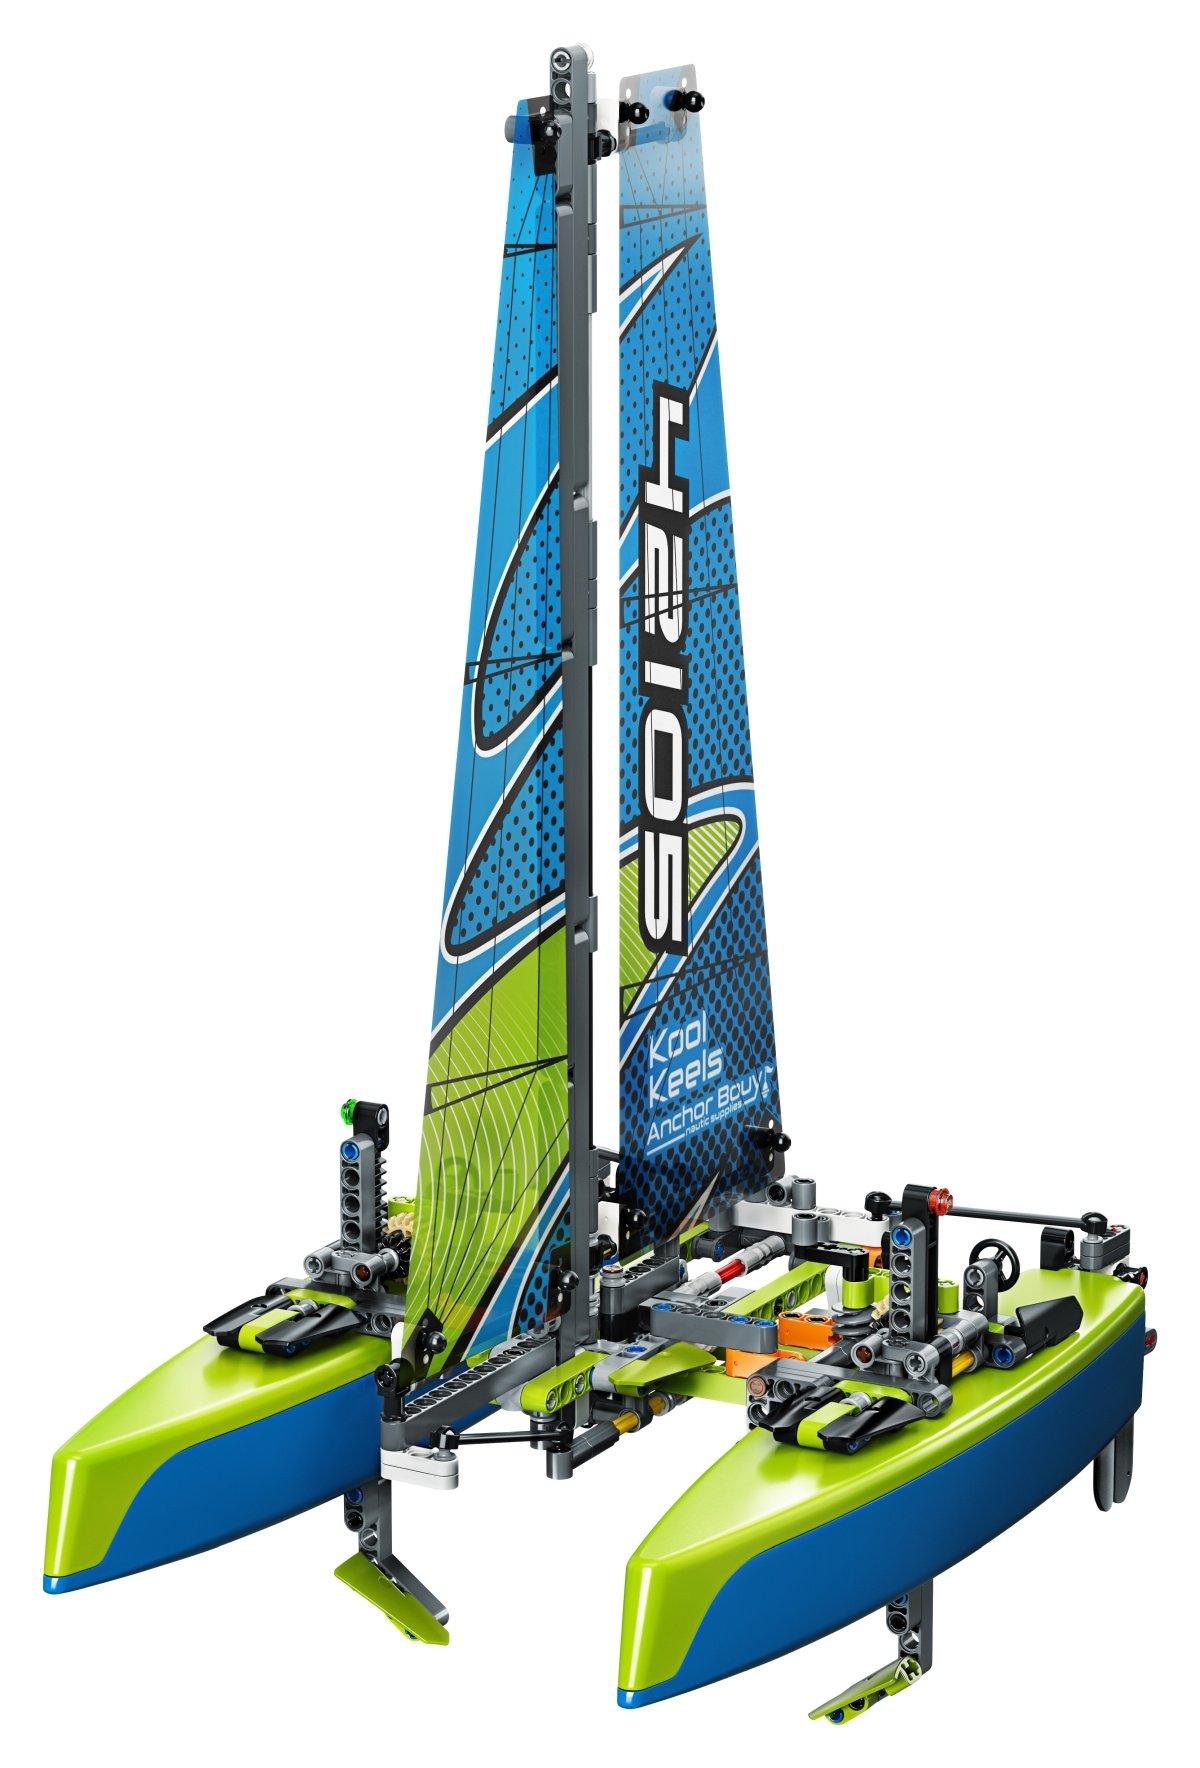 42105-lego-technic-catamaran-inhalt-2020 zusammengebaut.com